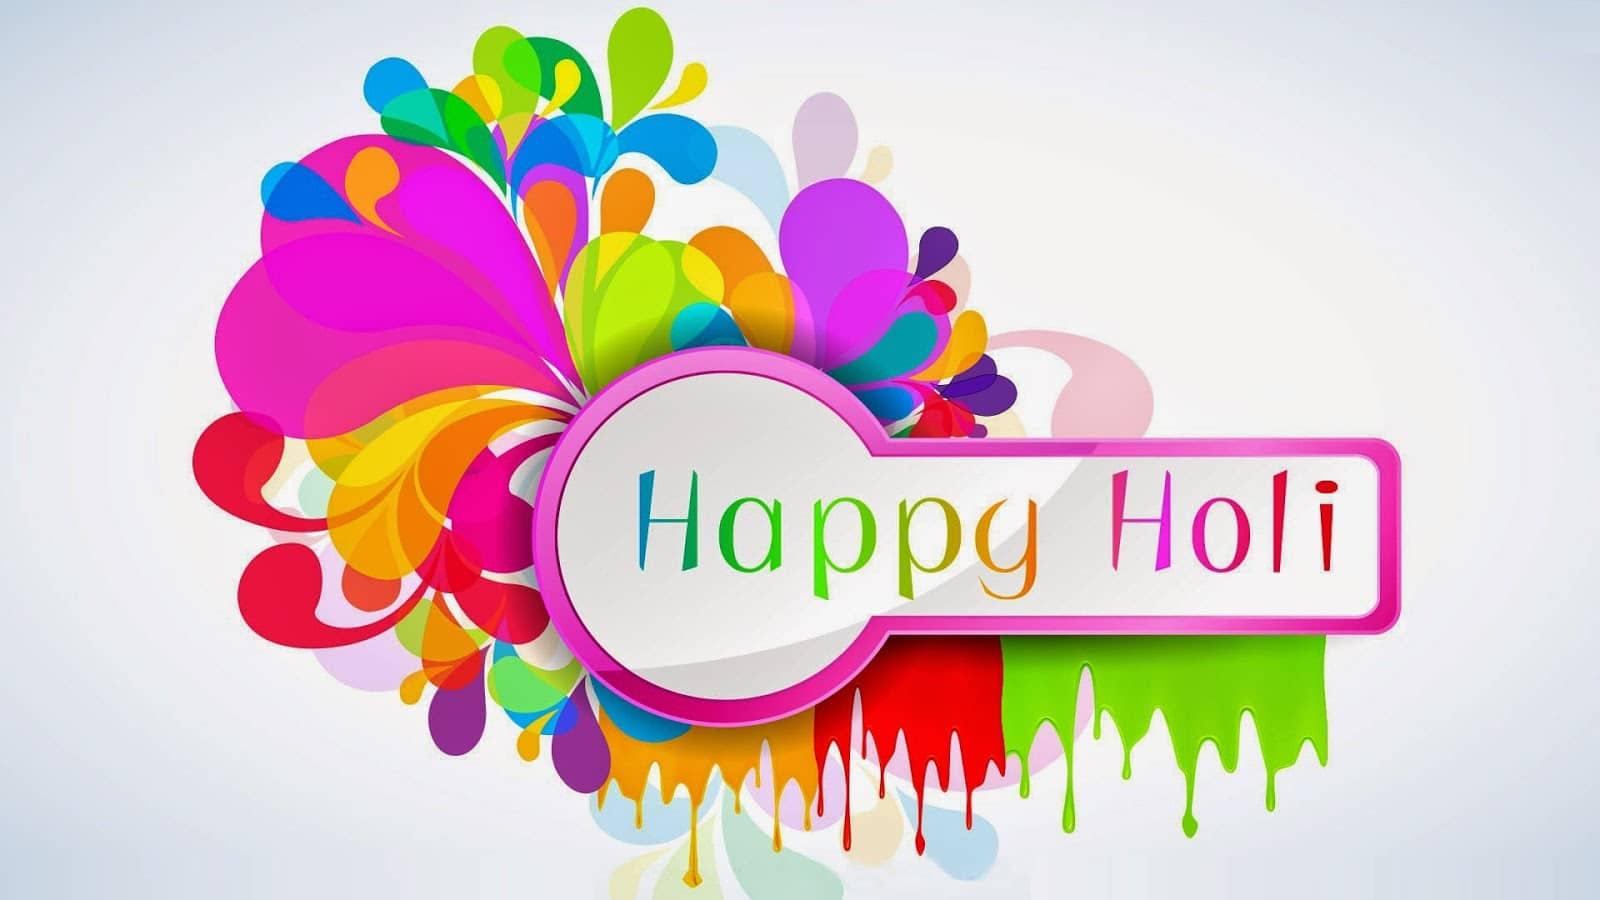 Happy Holi 2017 wallpaper download in HD